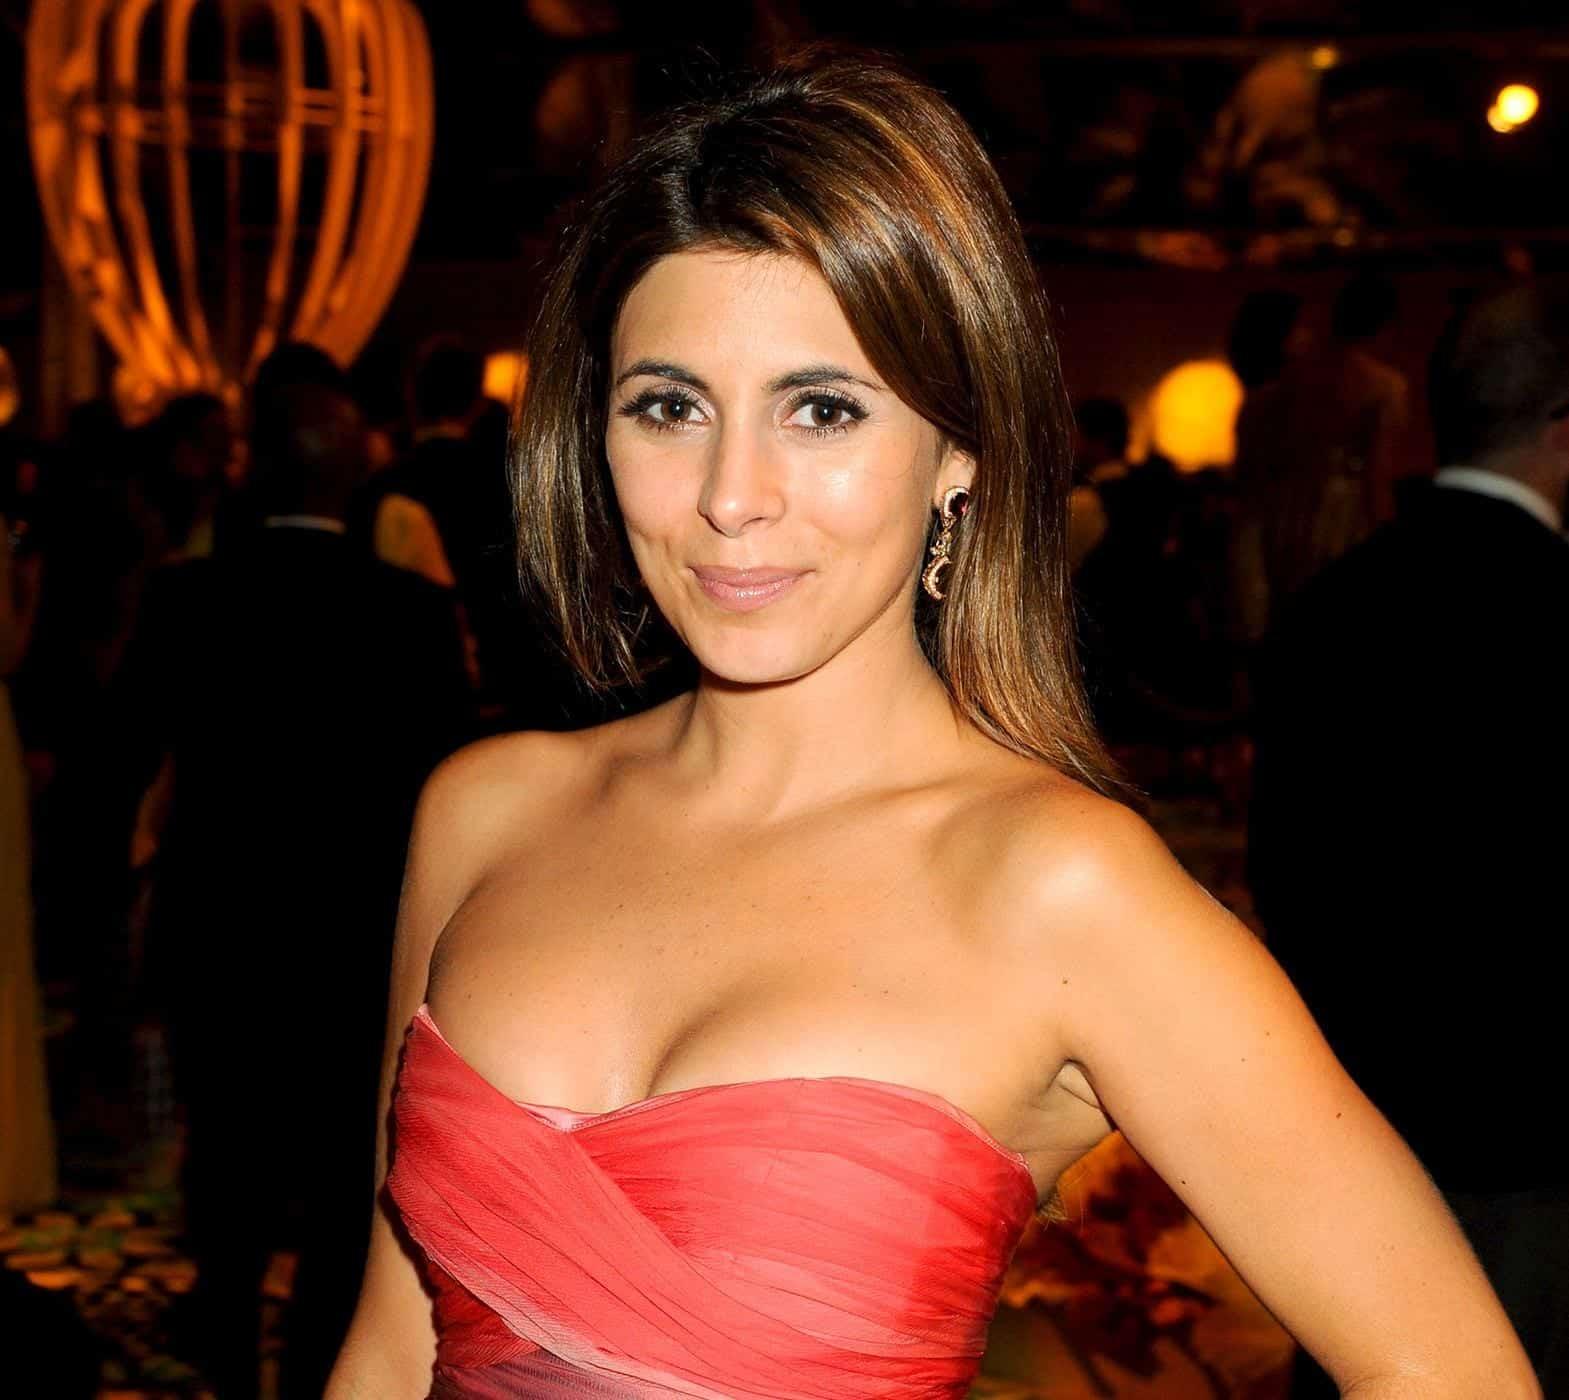 Cute Jewish Girls 30 Most Pretty Jewish Women In The World